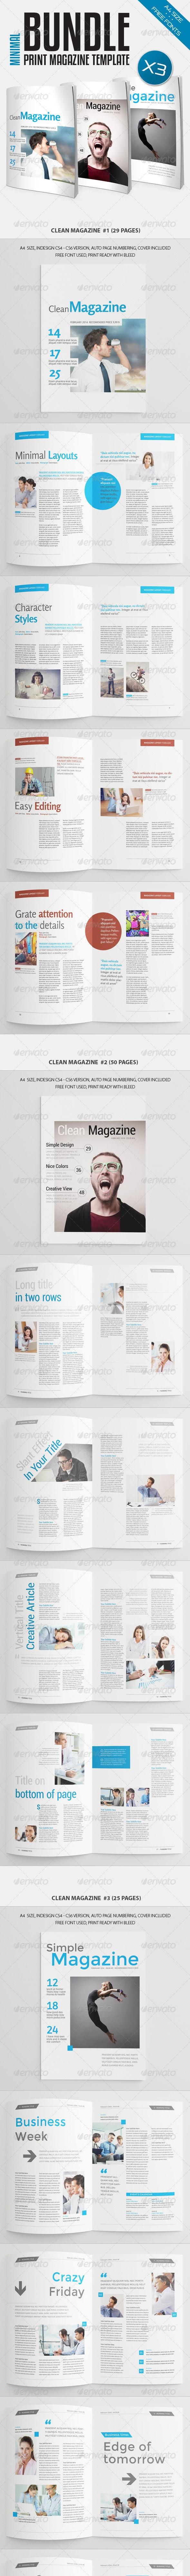 Minimal Magazine Bundle Vol4 - Magazines Print Templates